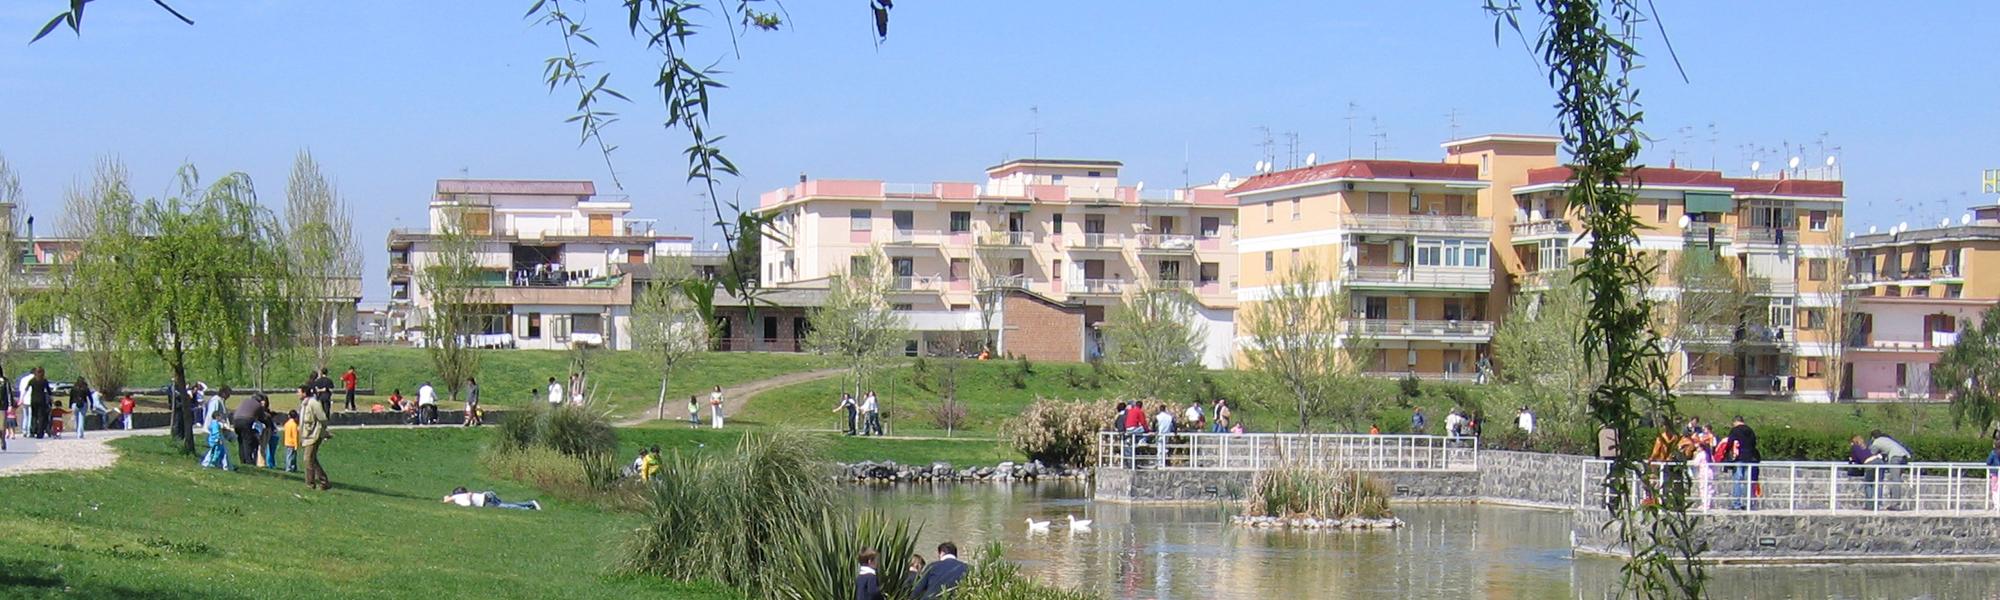 Pomigliano d'Arco